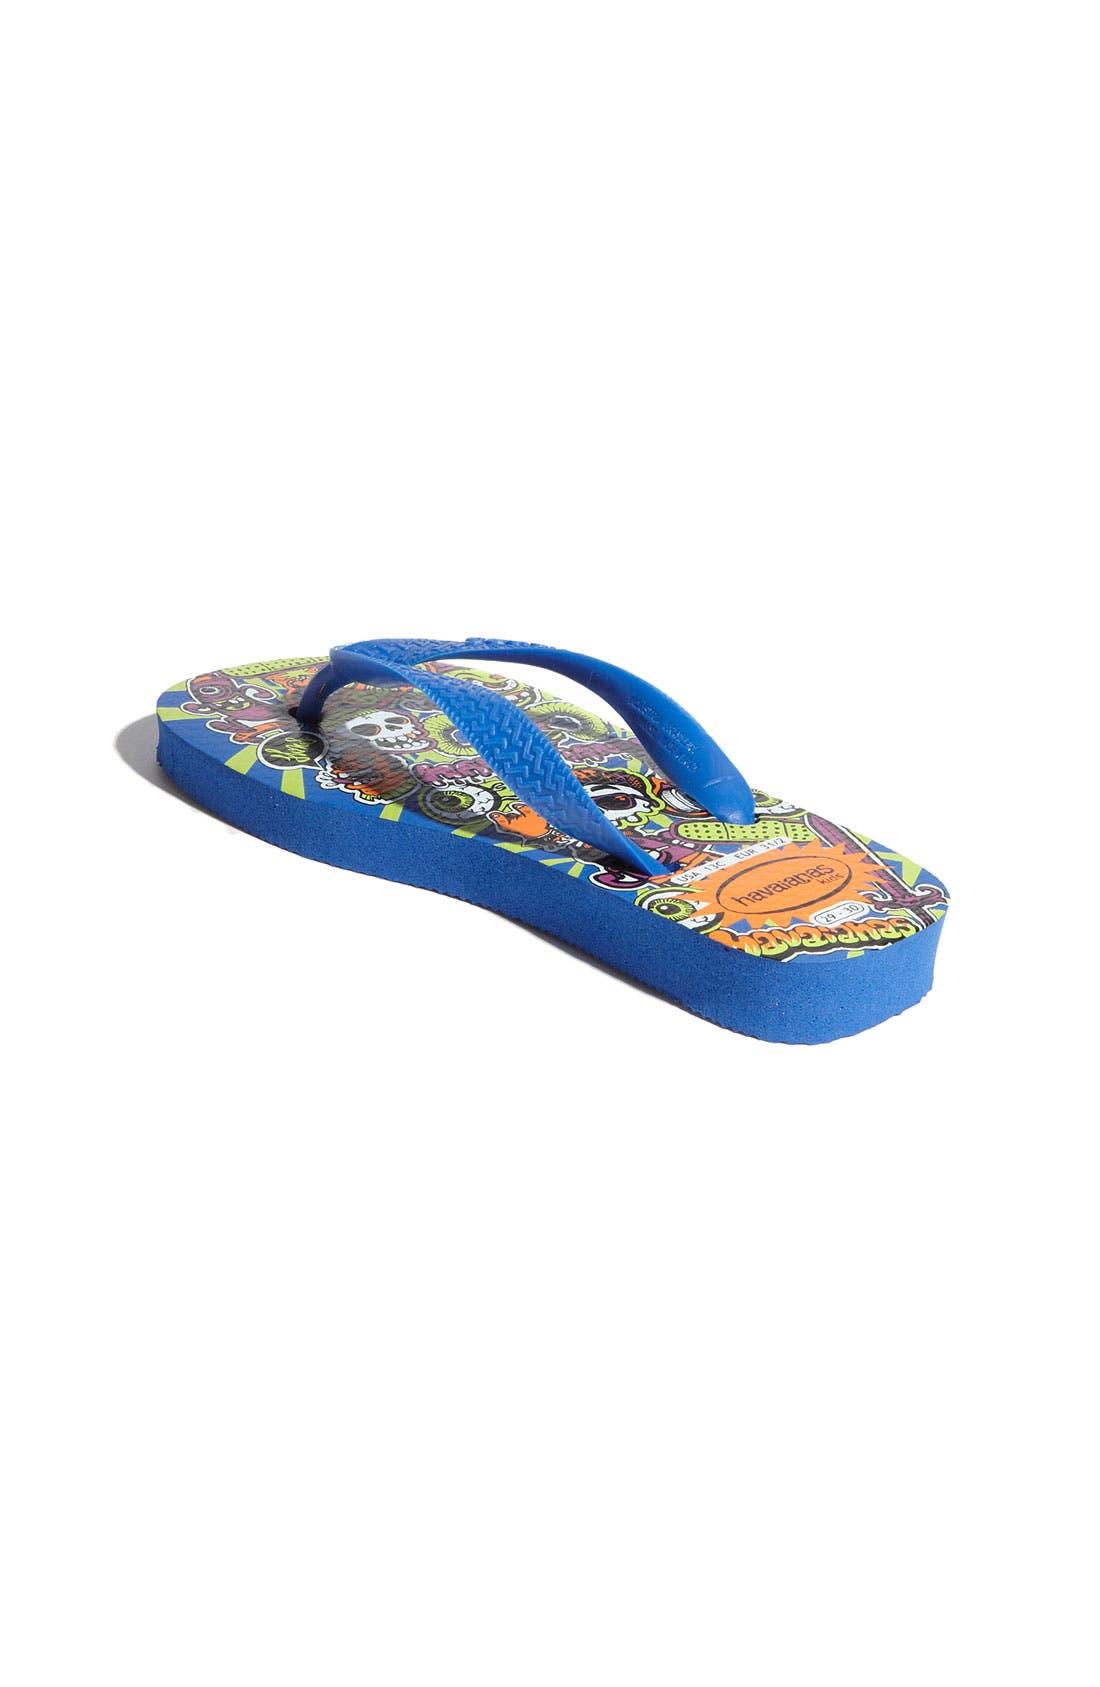 Alternate Image 2  - Havaianas 'Skate' Sandal (Toddler & Little Kid)